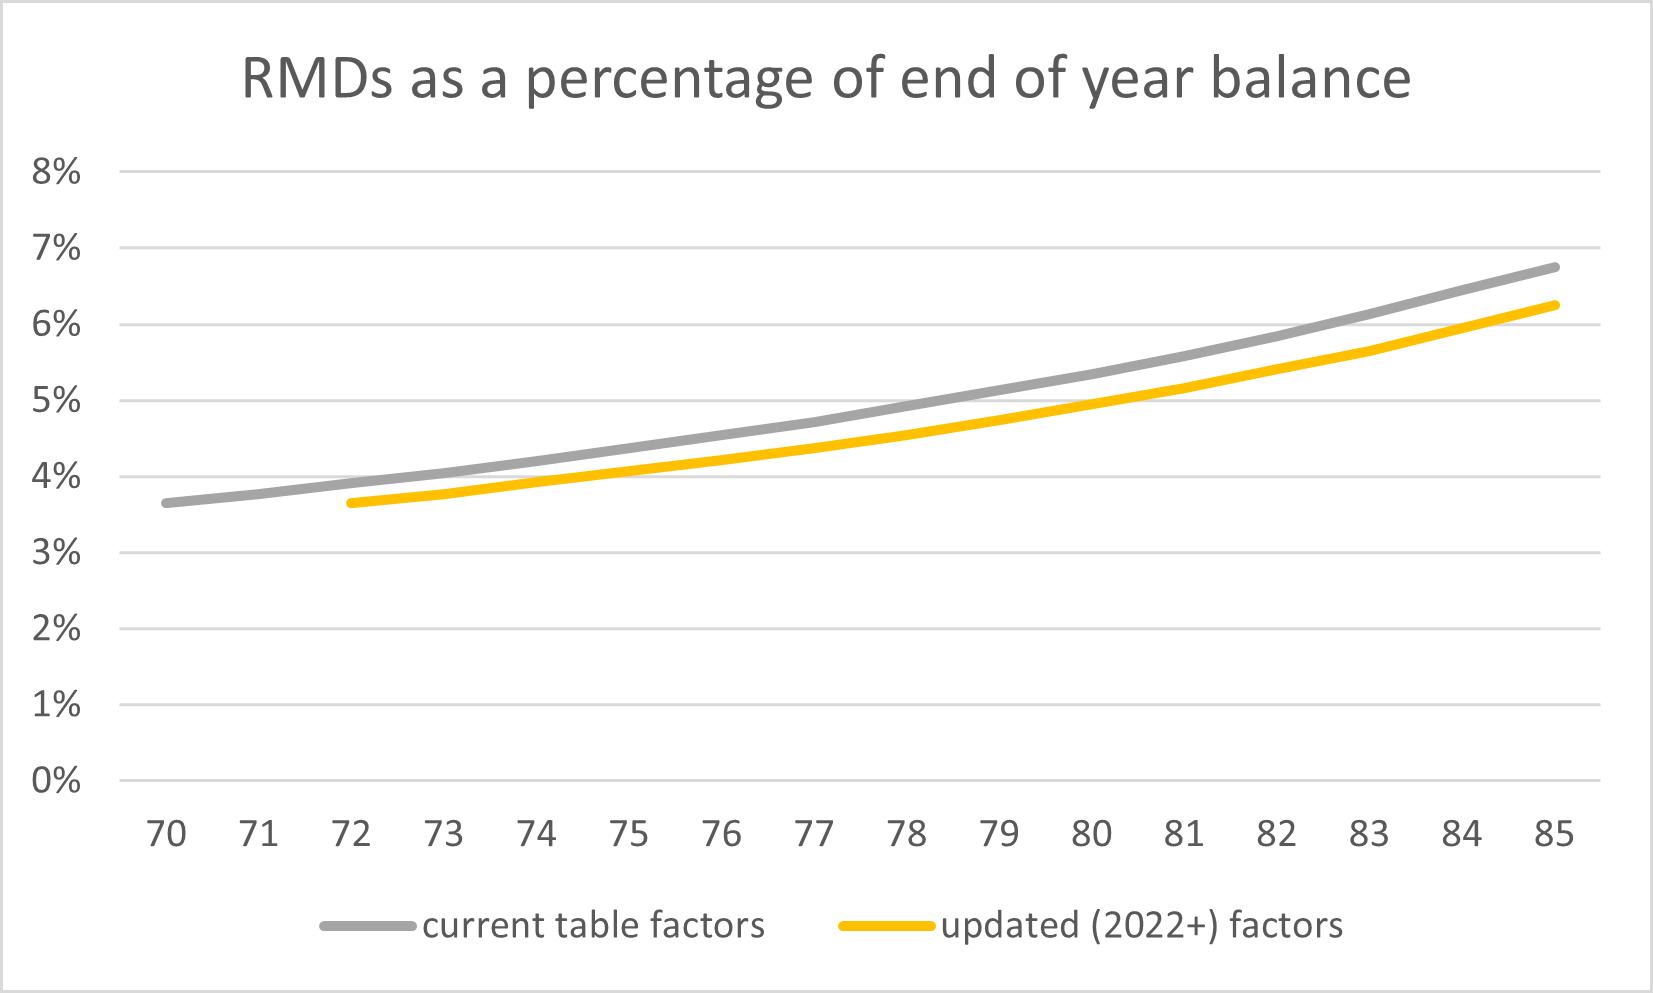 RMD as a percentage of EOY balance